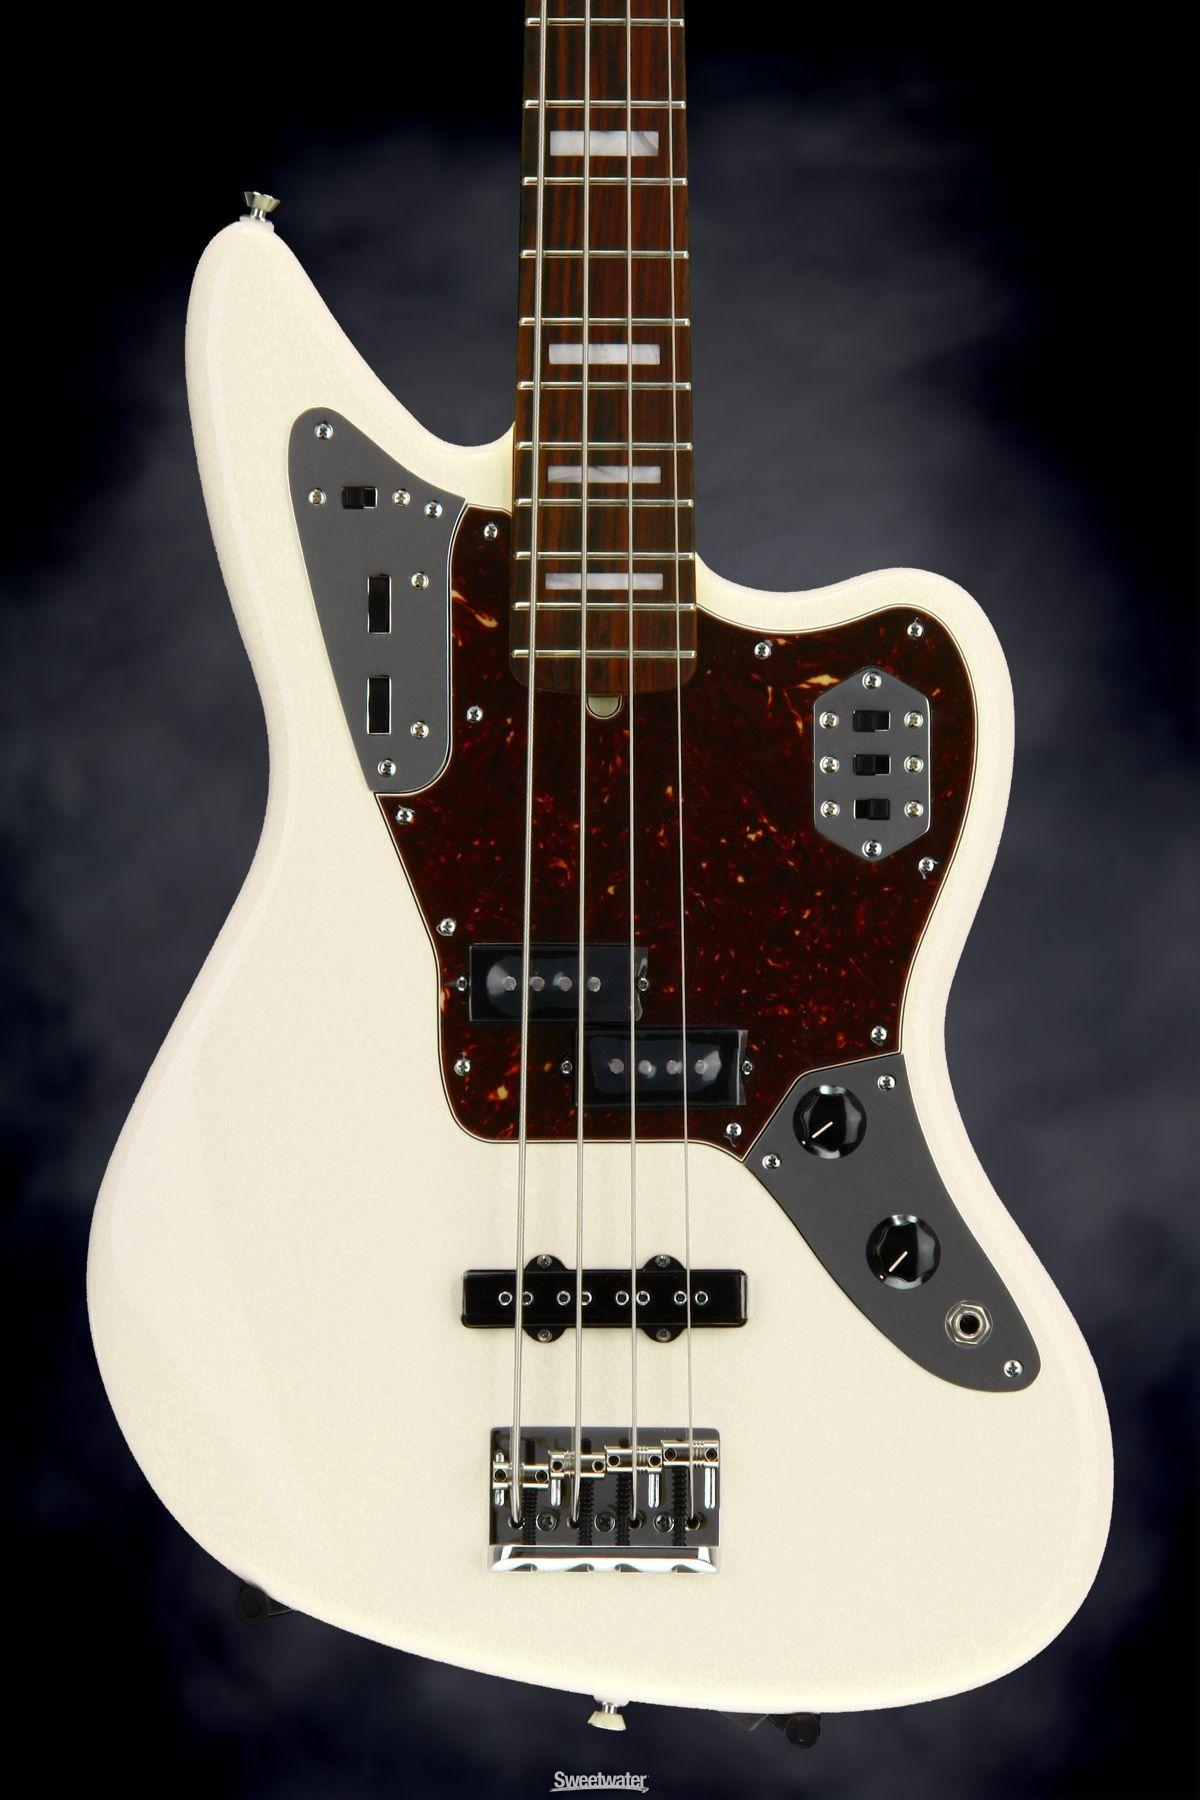 charming jaguar bass active eq wiring diagram contemporary Single Coil Guitar Wiring Diagrams Fender Guitar Wiring Diagrams